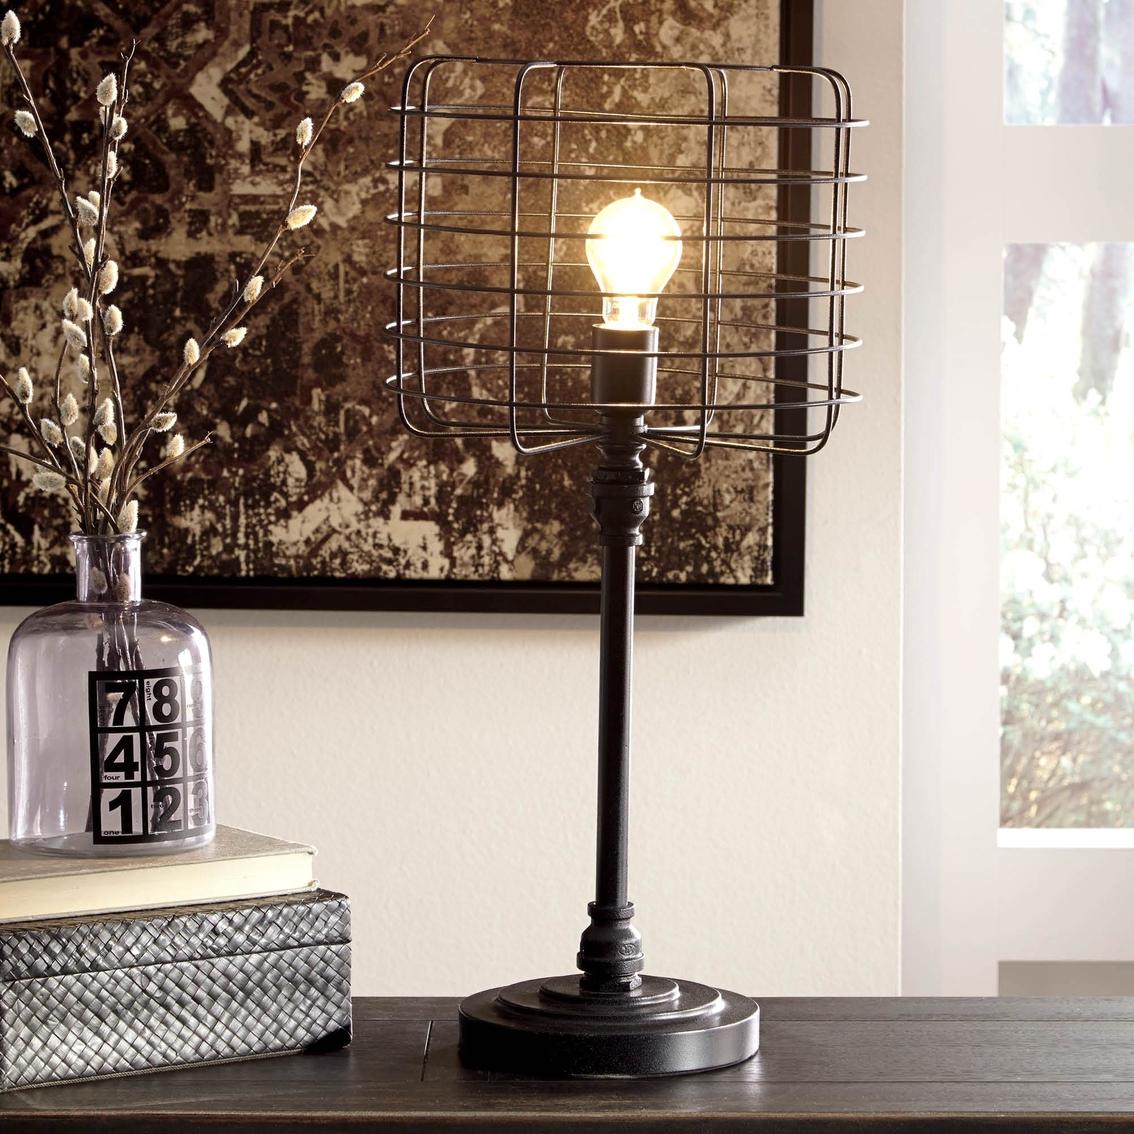 Signature design by ashley javan metal table lamp antique - Antique exchange home design baltimore md ...